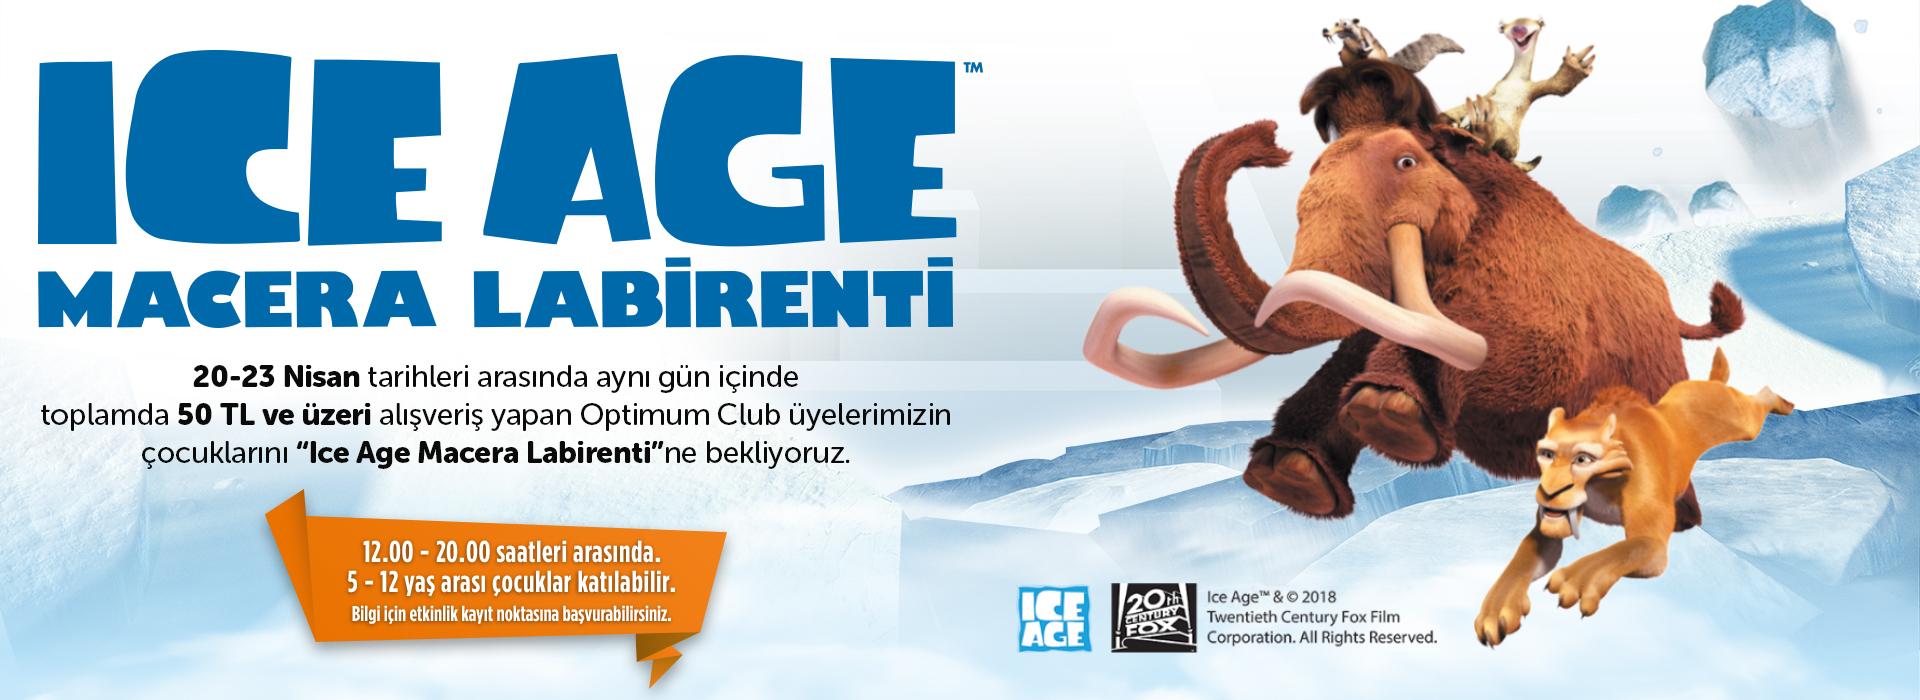 Ice Age Macera Labirenti